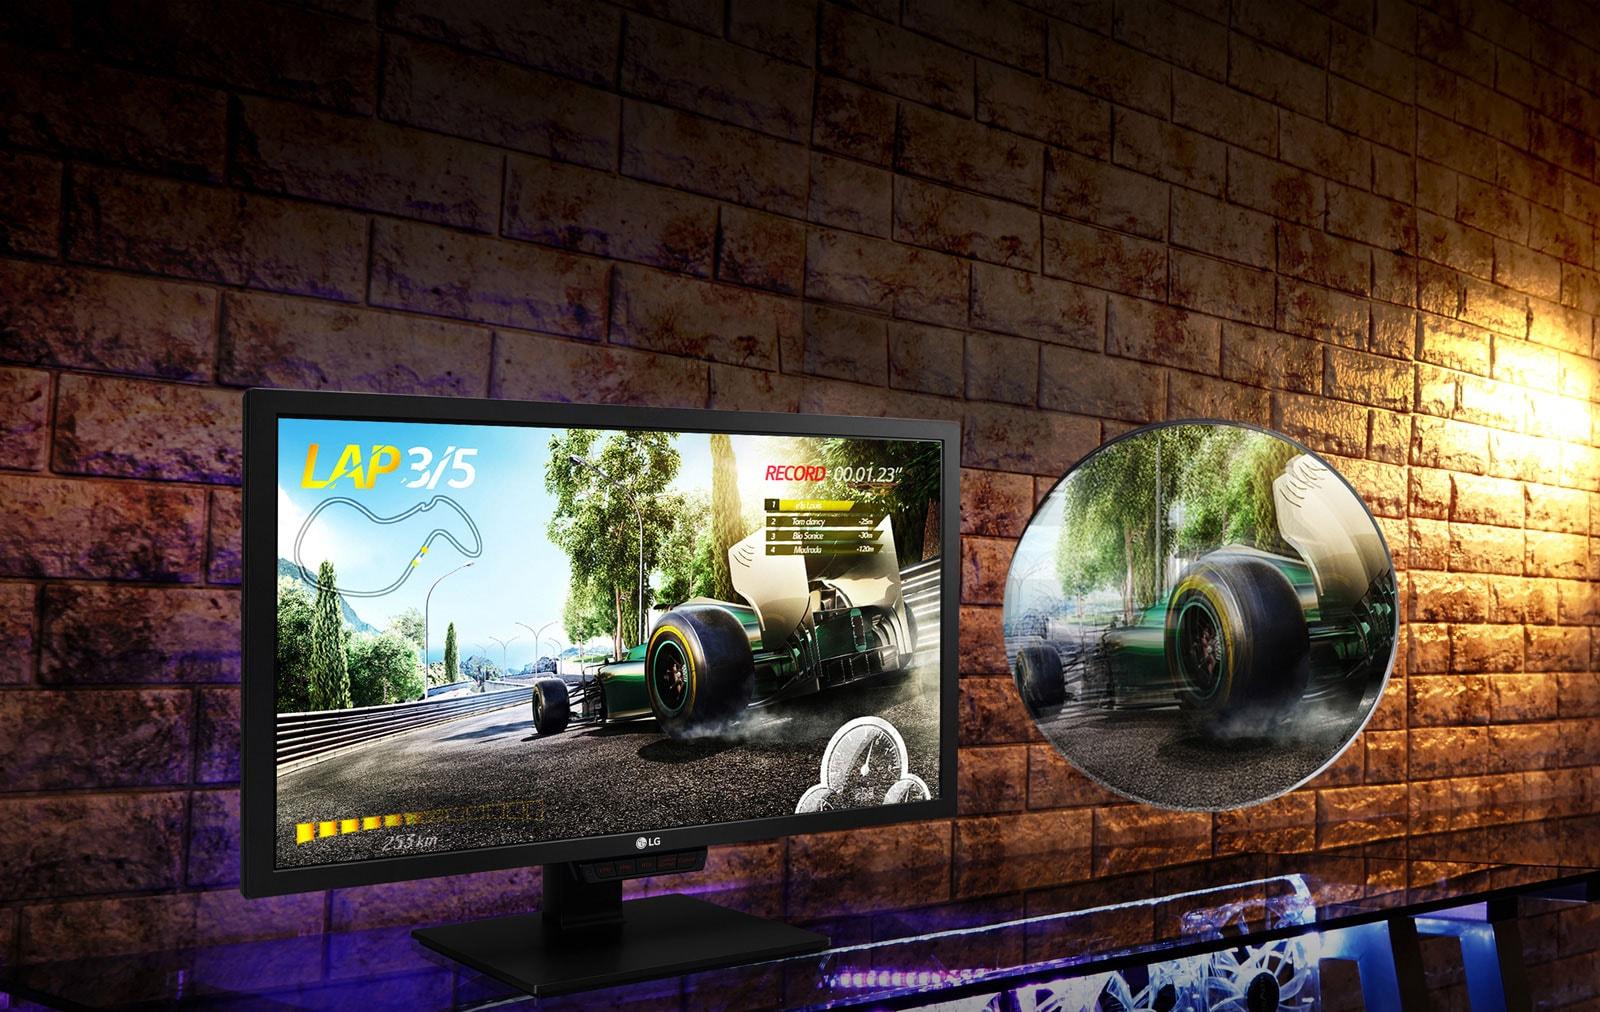 "Monitor Gamer 24"" LG LED Full HD 144Hz e AMD FreeSync | LG"